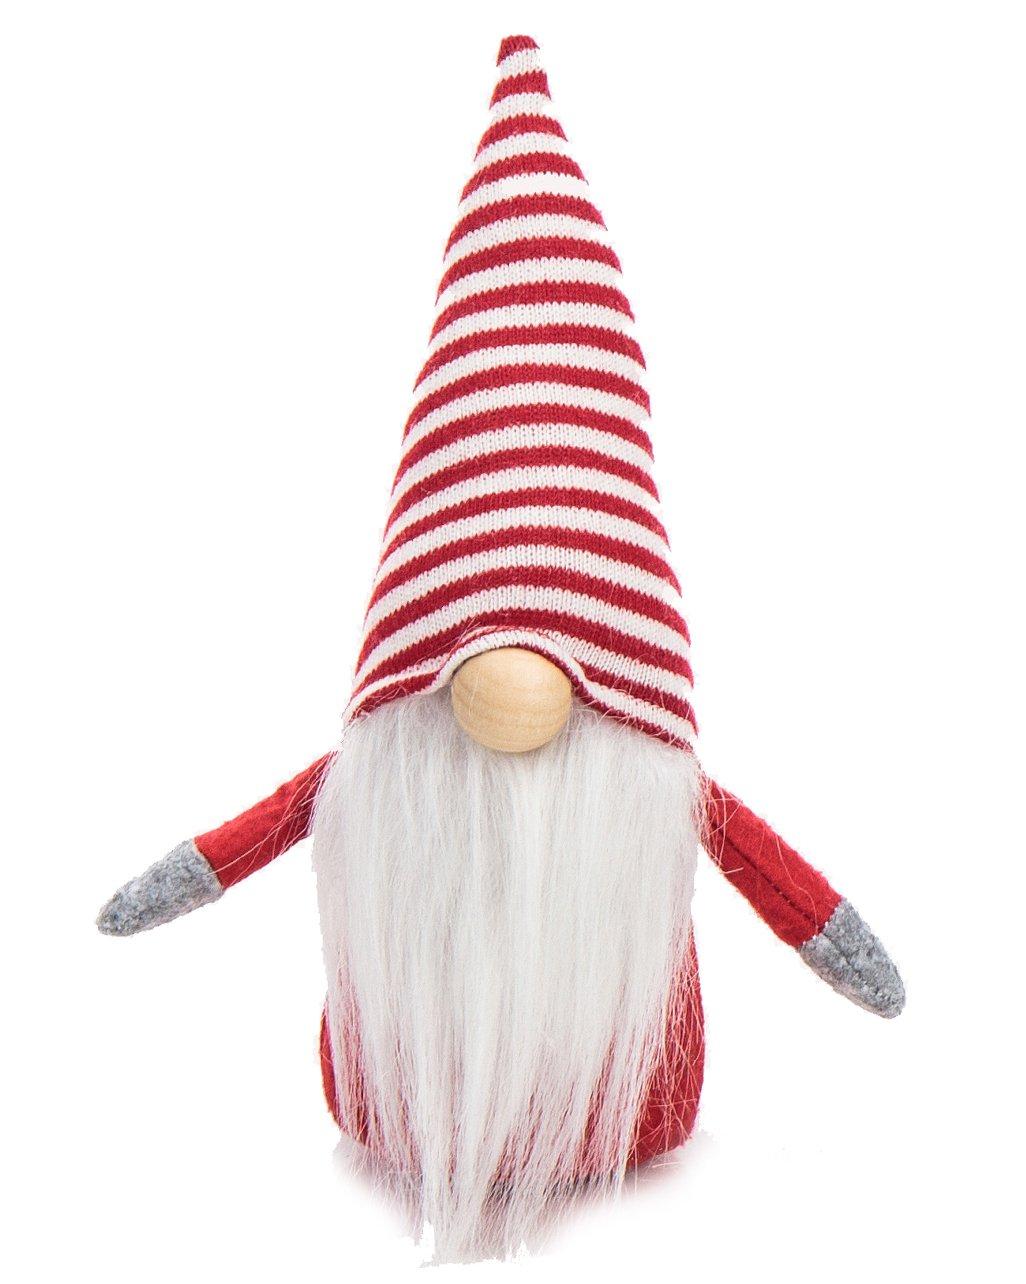 Christmas Gnome Decor.Handmade Swedish Tomte Christmas Gnome Christmas Ornaments Gifts Holiday Home Table Decor 8 49